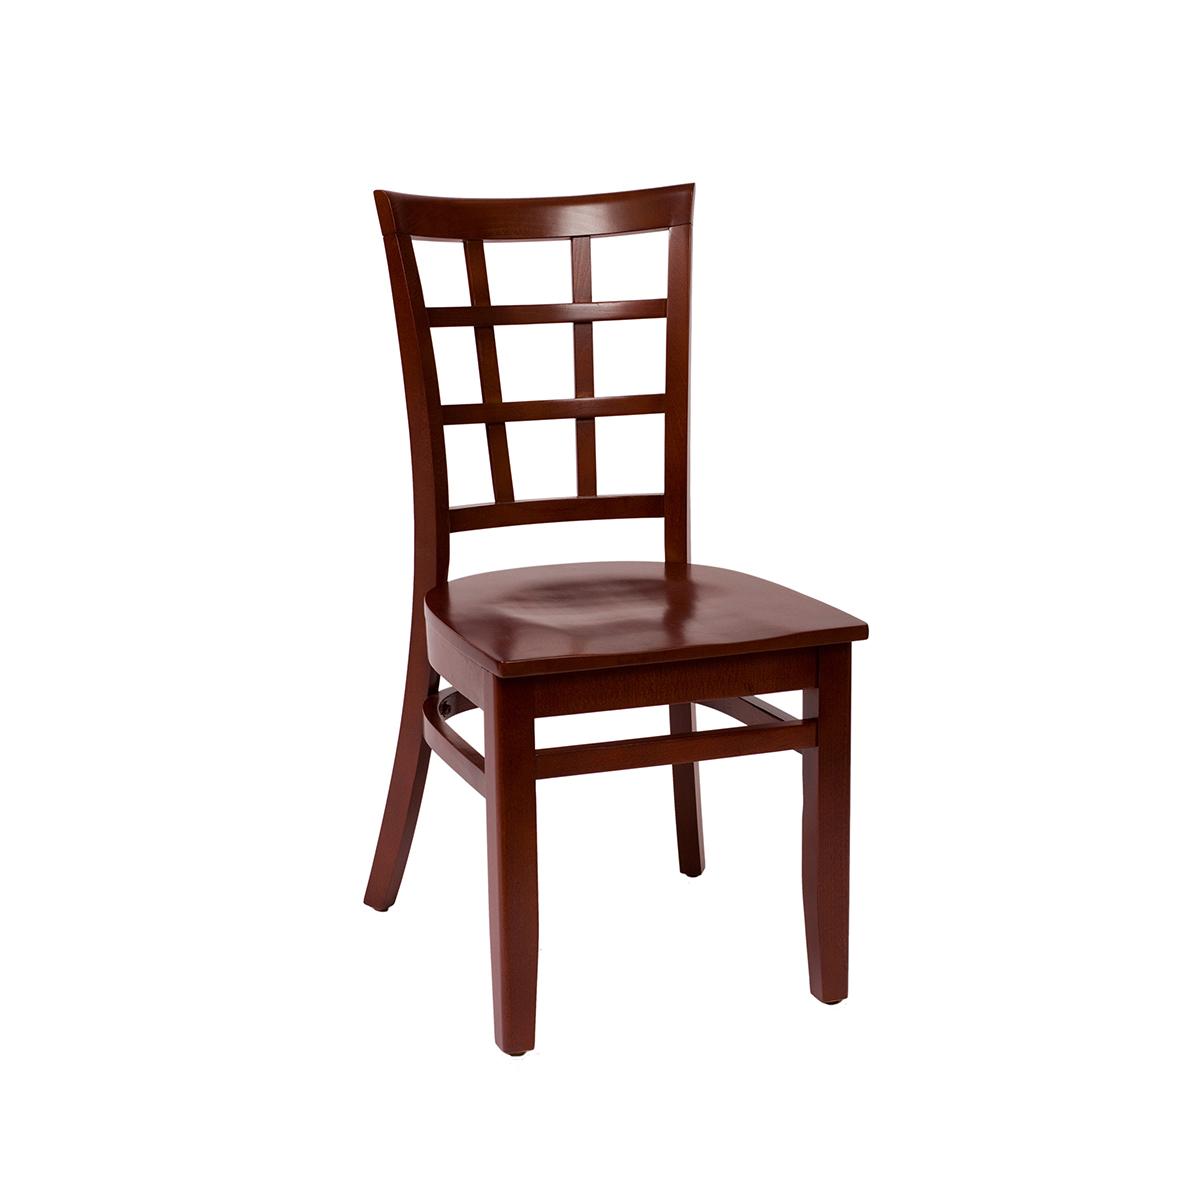 window pane side chair with wood seat